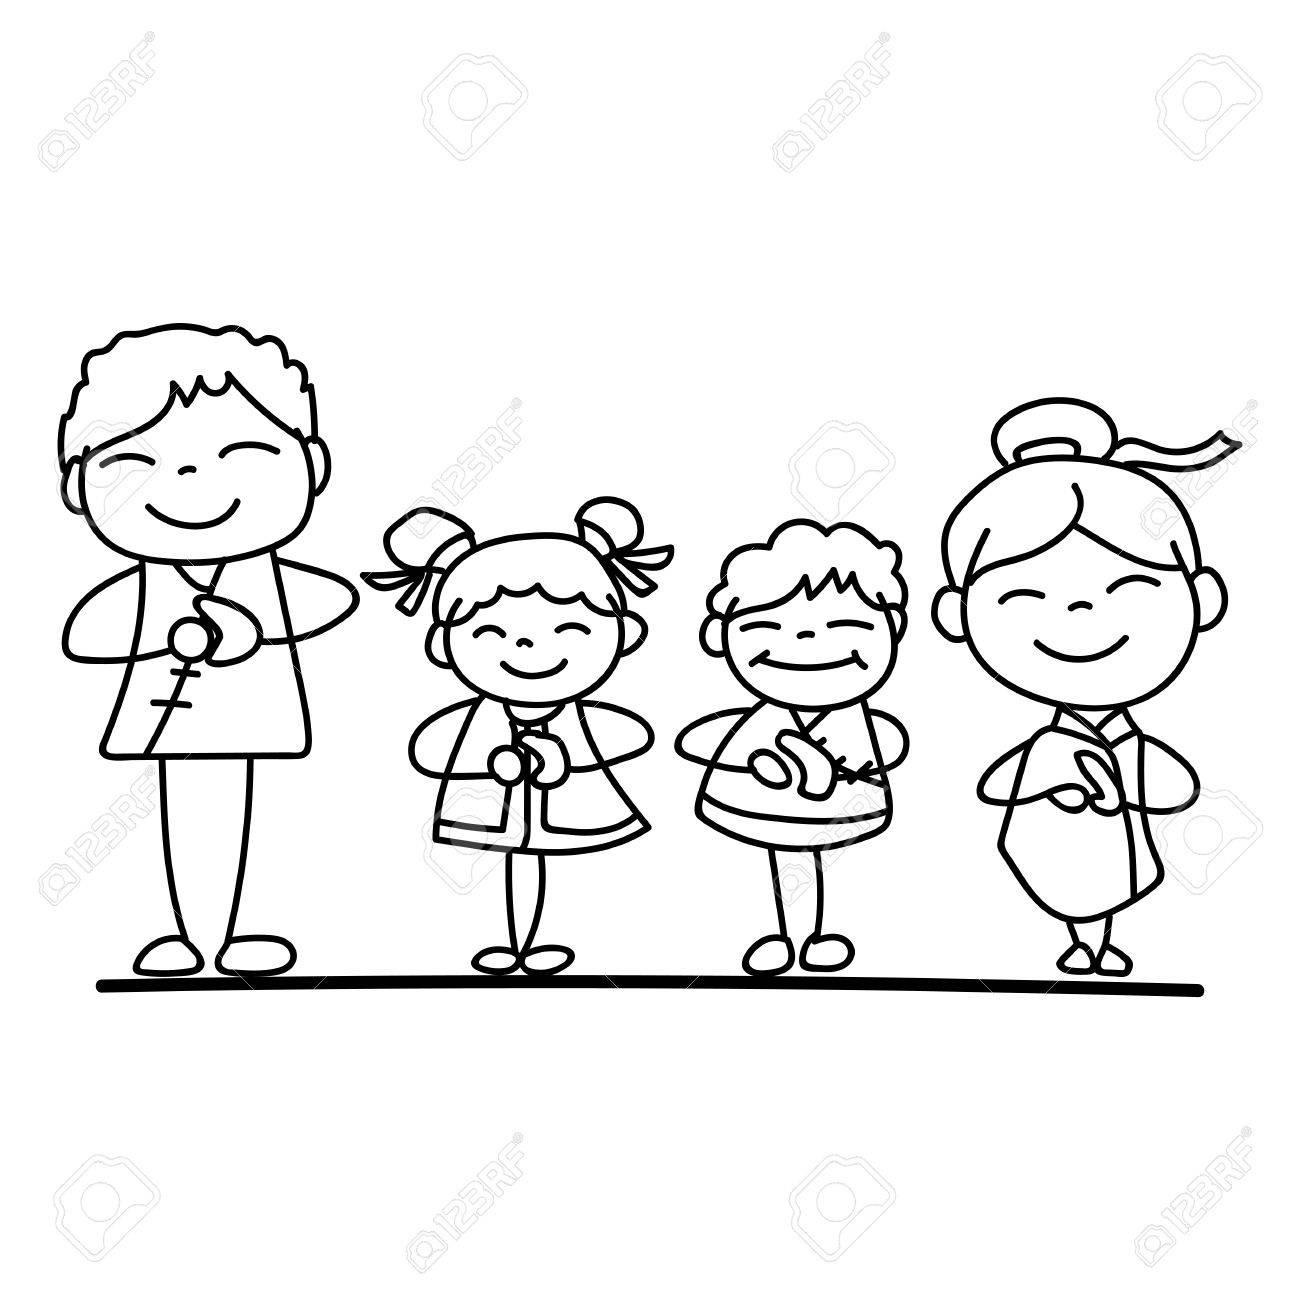 Conjunto De Personaje De Dibujos Animados De Dibujo A Mano Familia